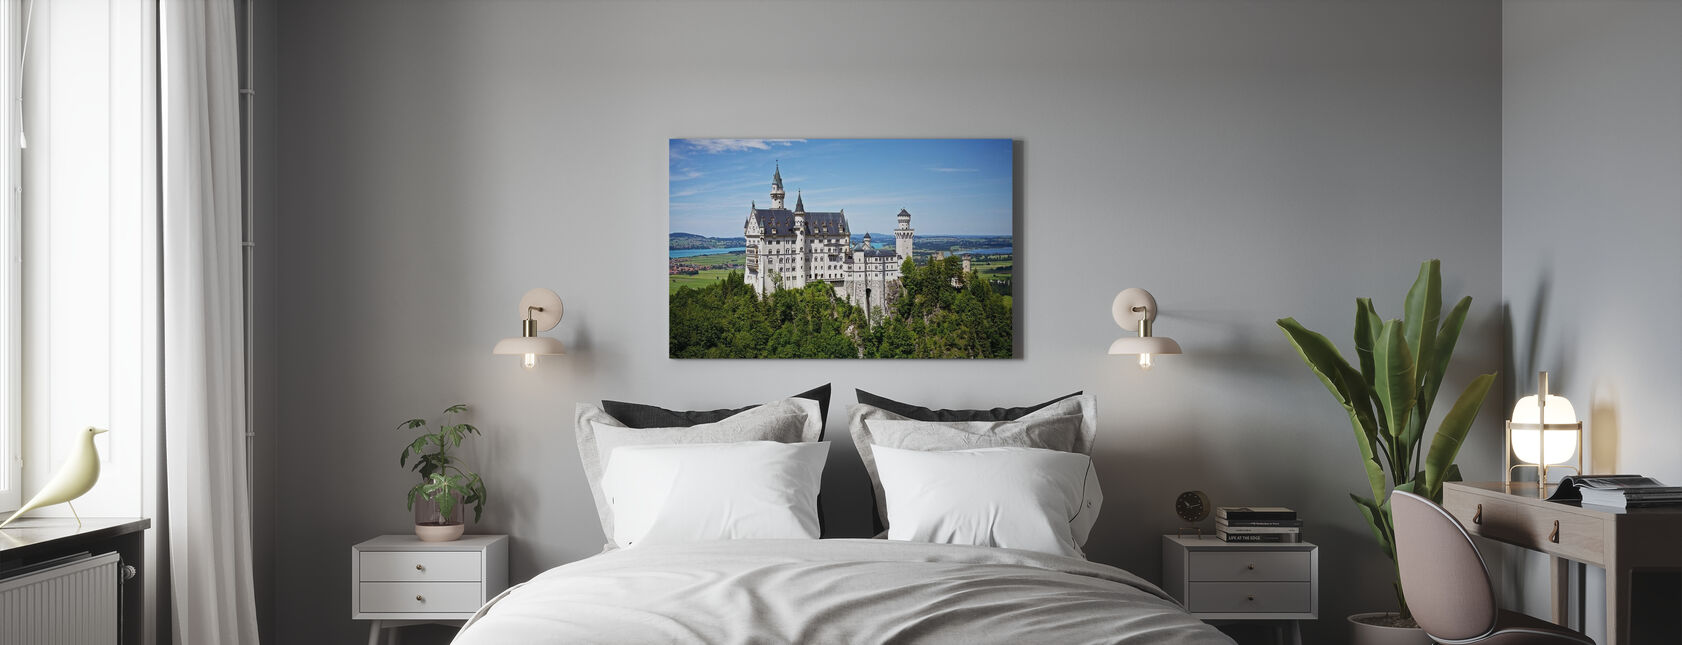 Neuschwanstein Disney Castle - Canvas print - Bedroom